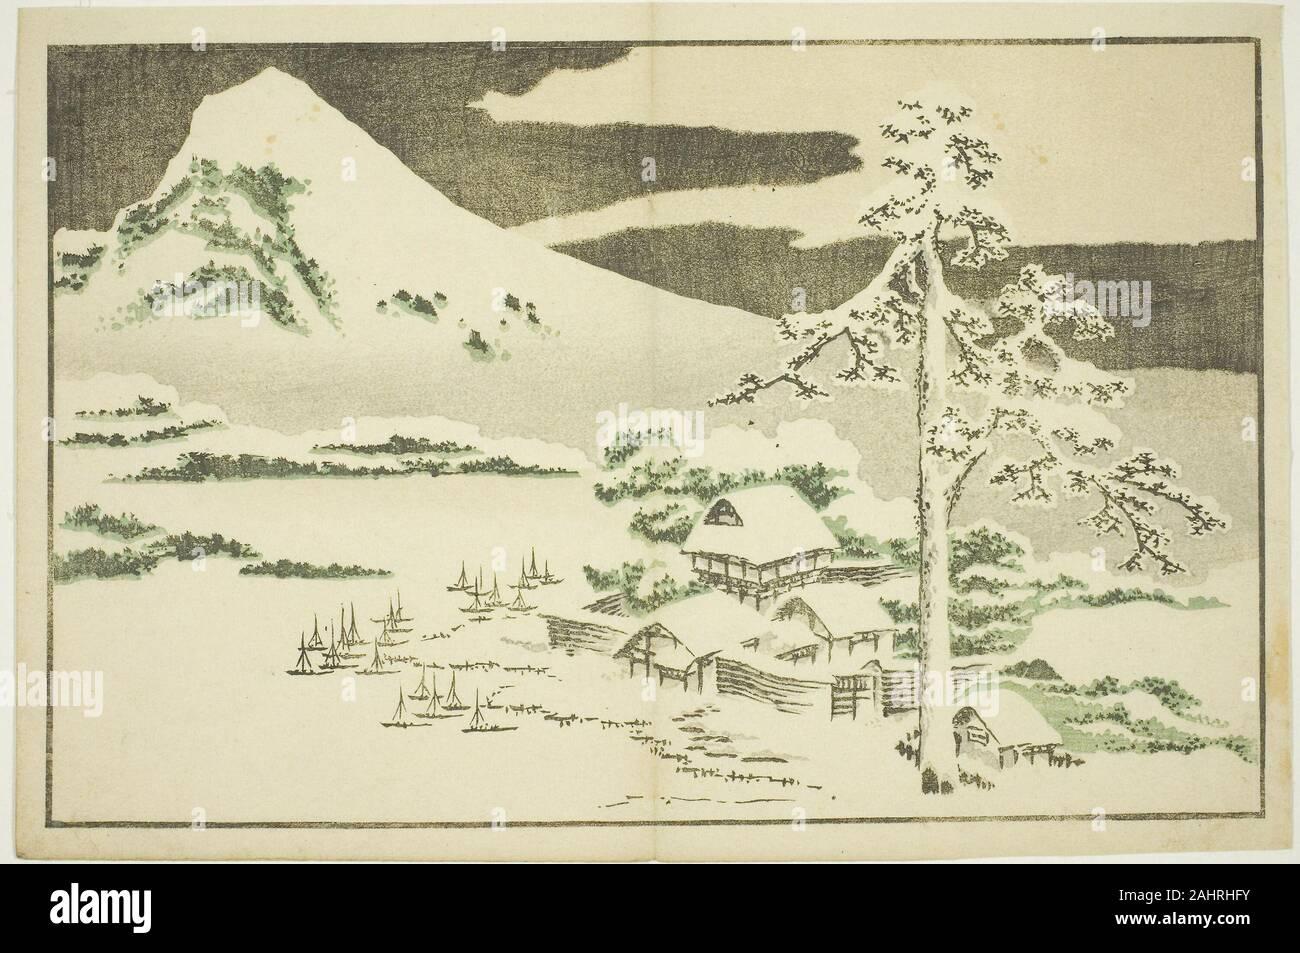 Katsushika Hokusai Mount Fuji In Winter From The Picture Book Of Realistic Paintings Of Hokusai Hokusai Shashin Gafu 1809 1819 Japan Color Woodblock Print Album Sheet Stock Photo Alamy